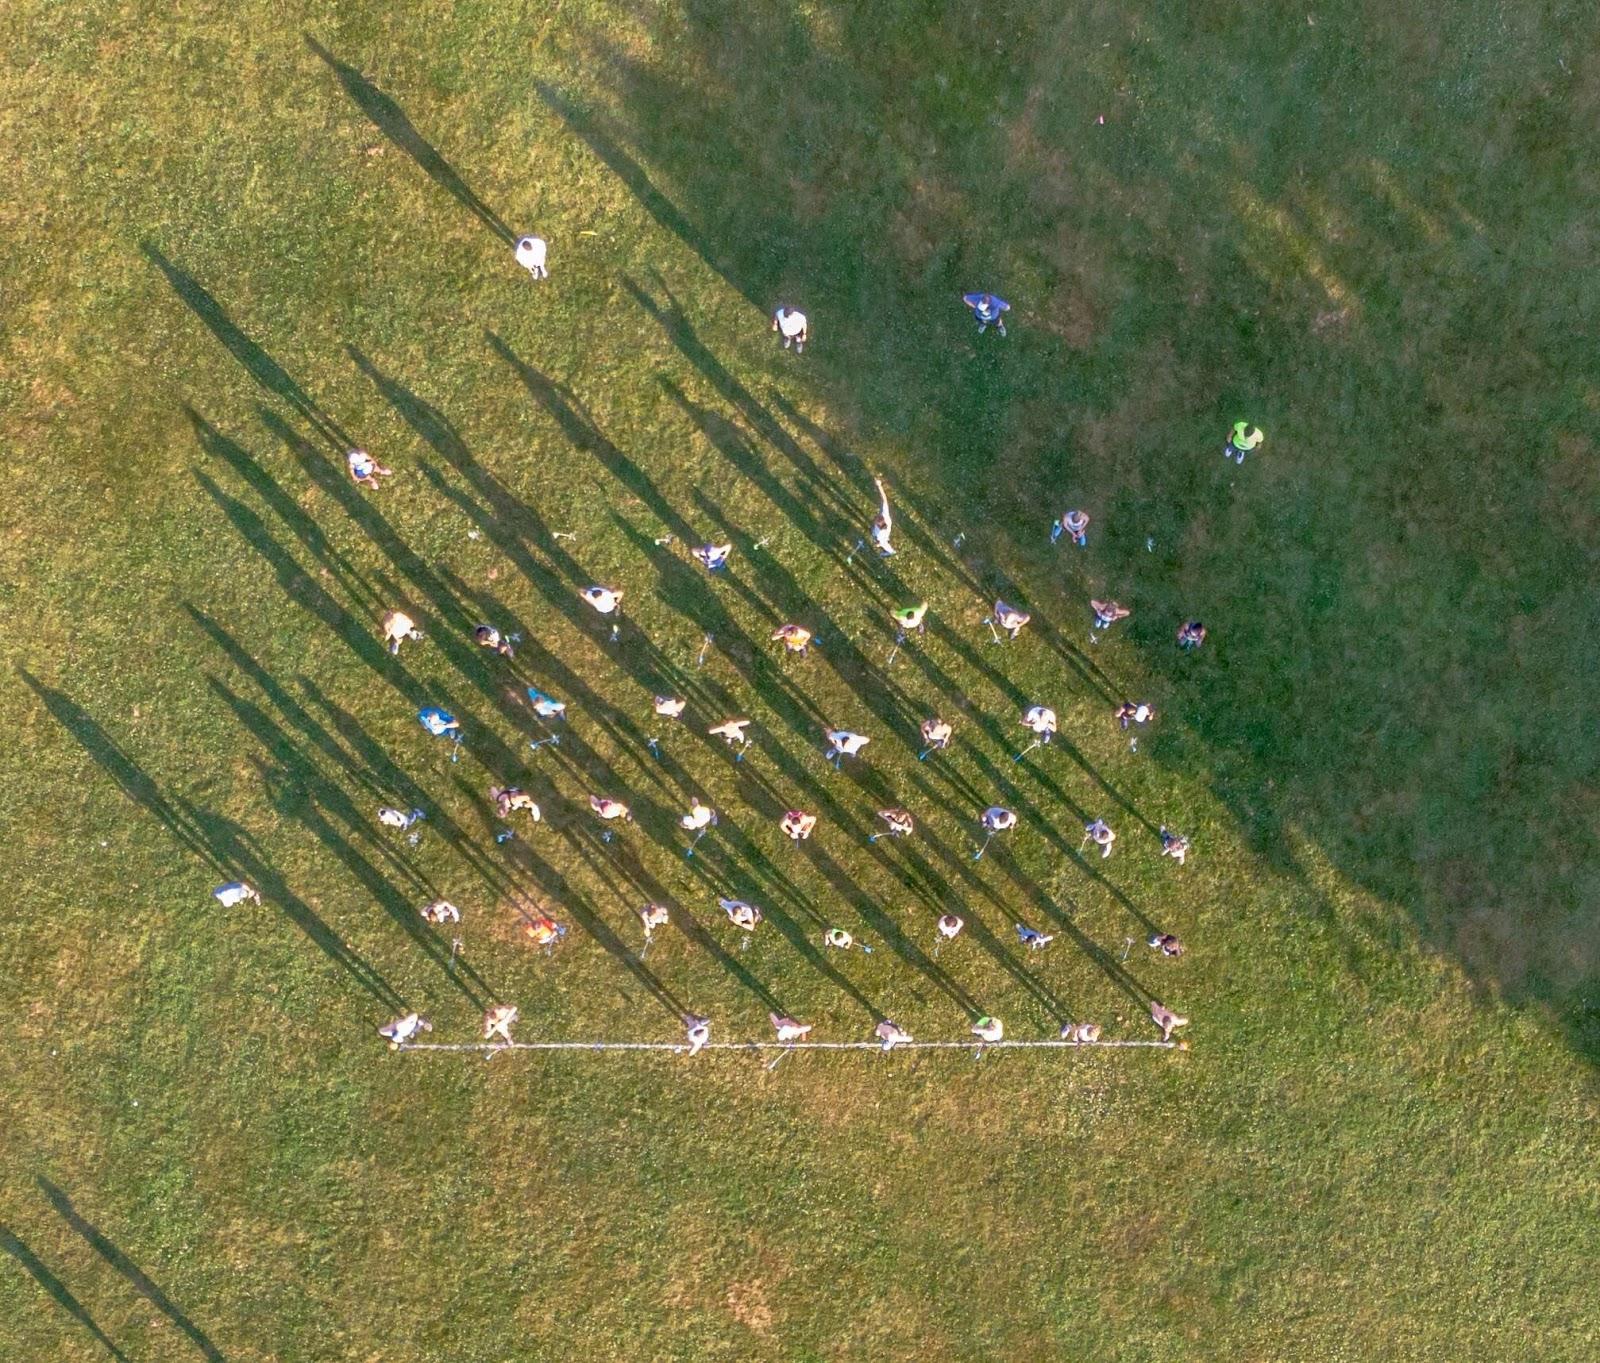 Hexagonal race start-line formation